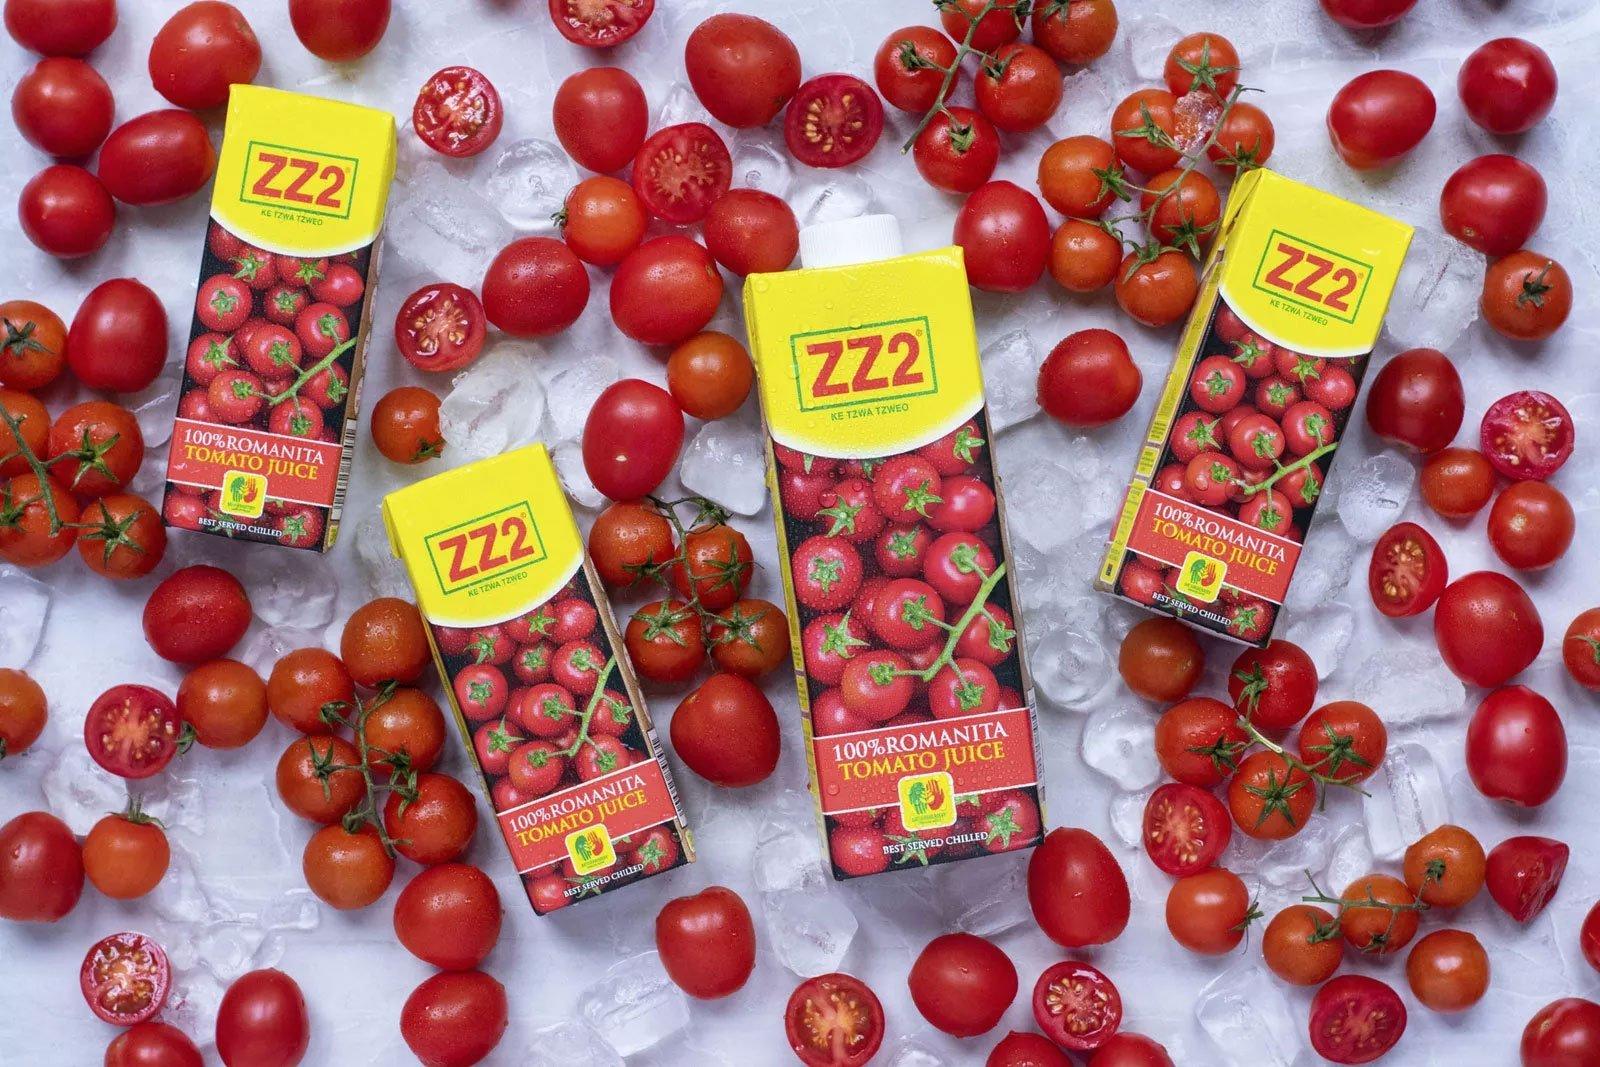 ZZ2 100% Romanita Tomato Juice